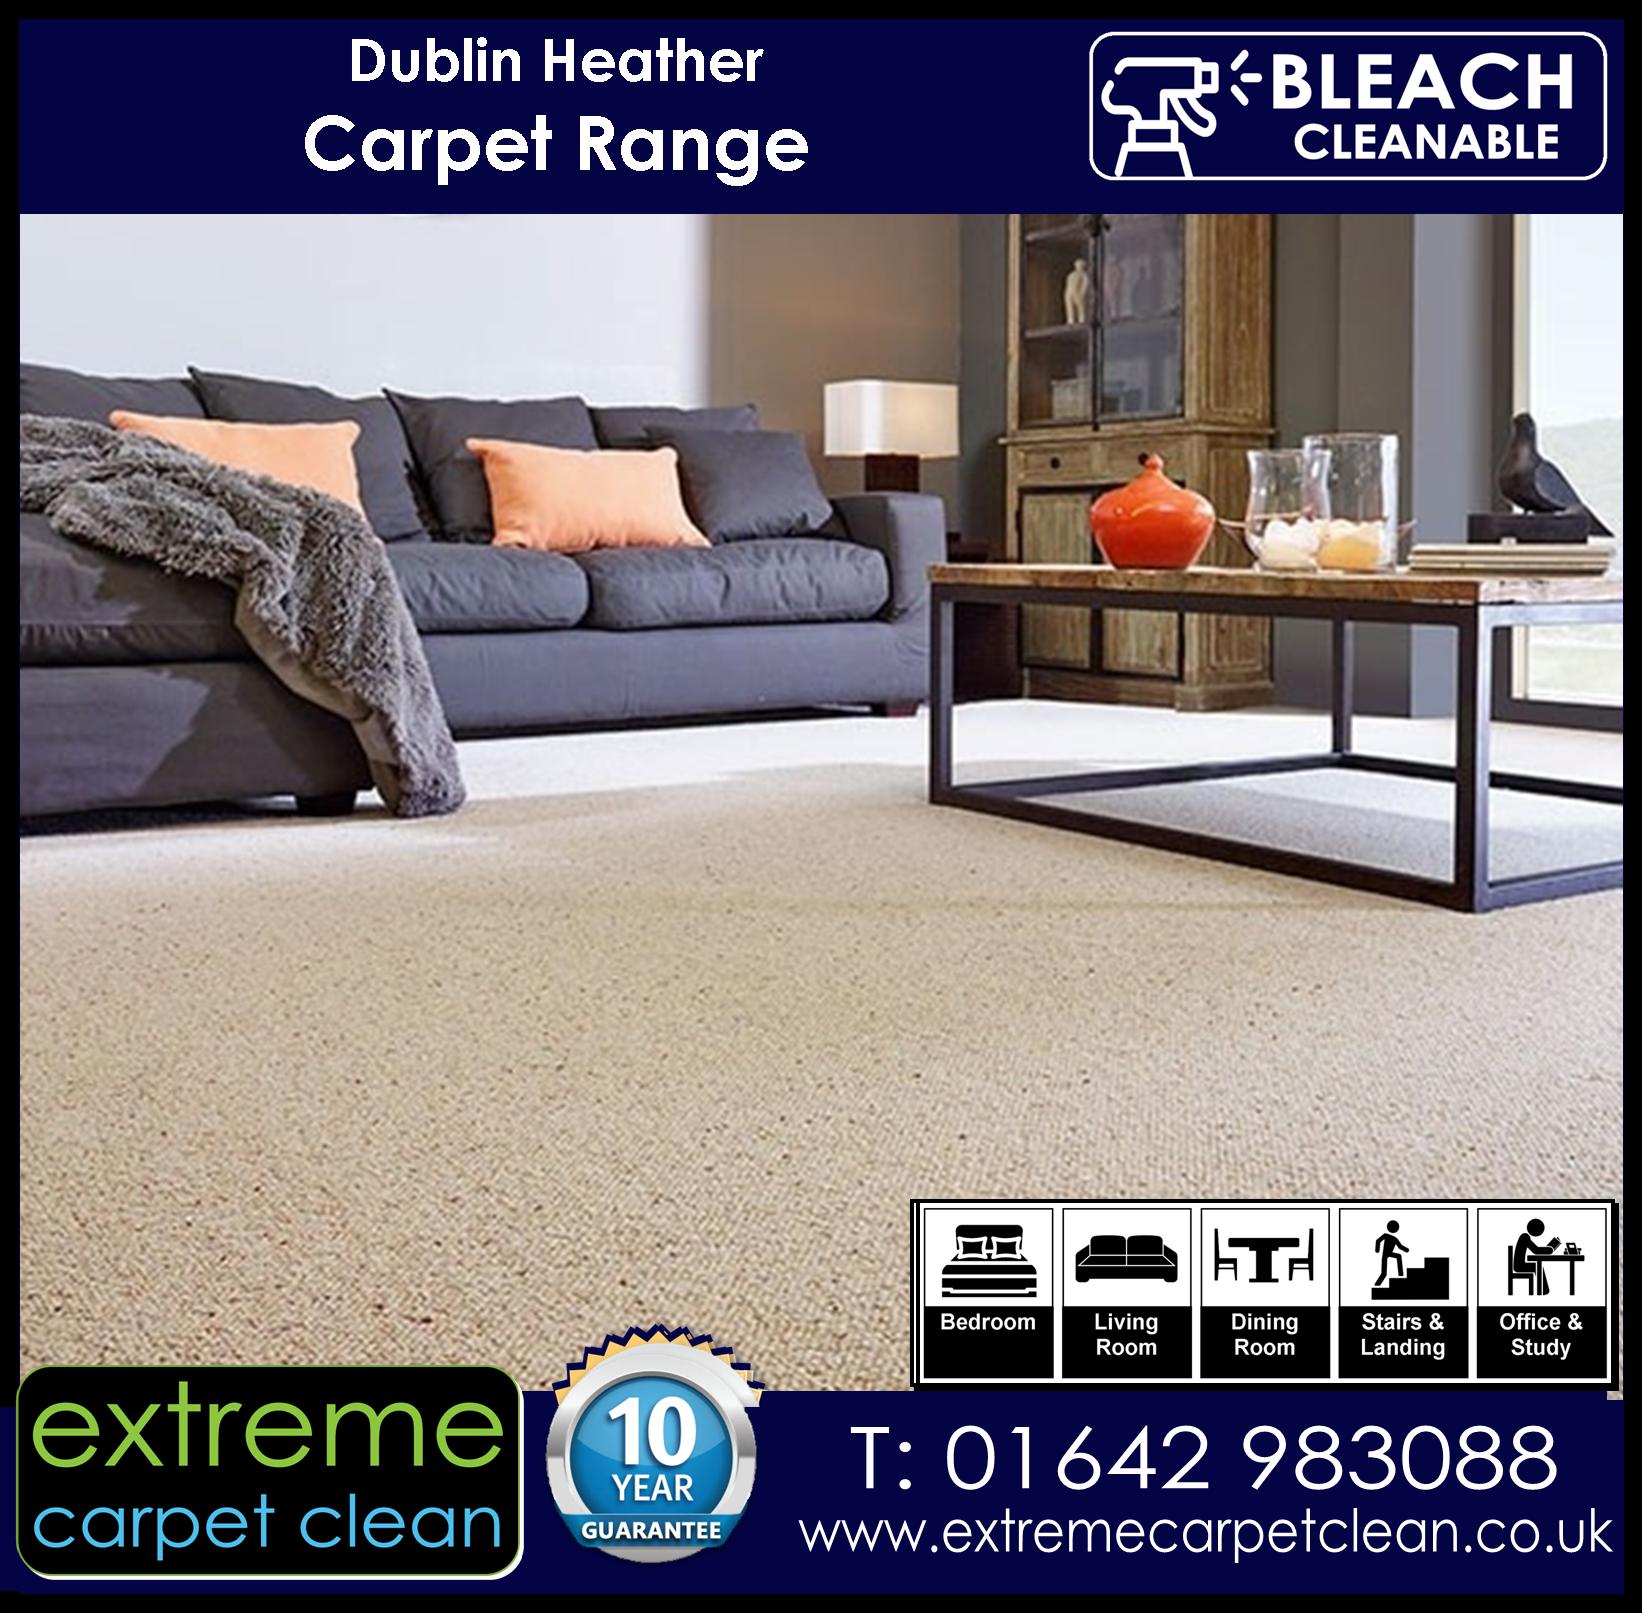 Extreme Carpet Clean, Dublin Heather Carpet Collection